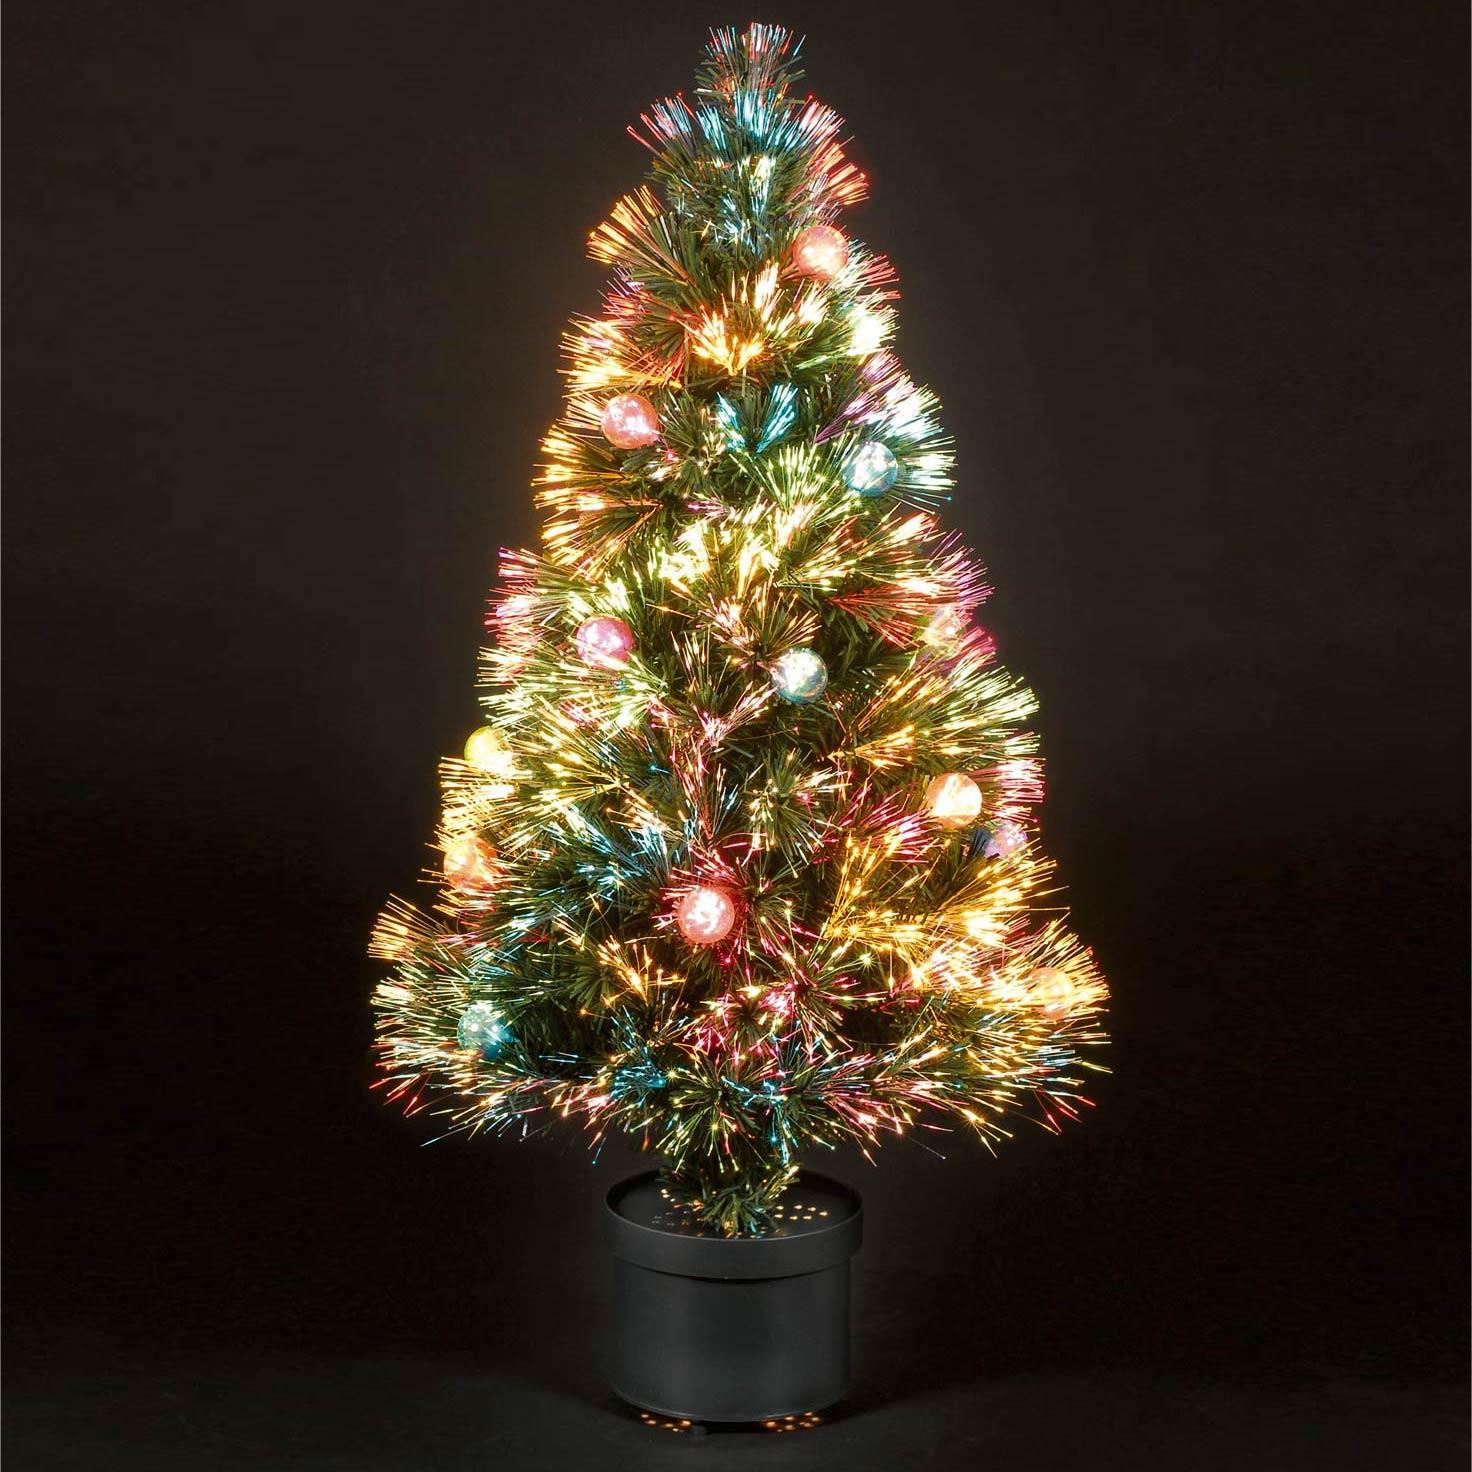 Christmas Tree With Lights Tesco: 2.75ft/80cm Coloured Bauble Fibre Optic Christmas Tree